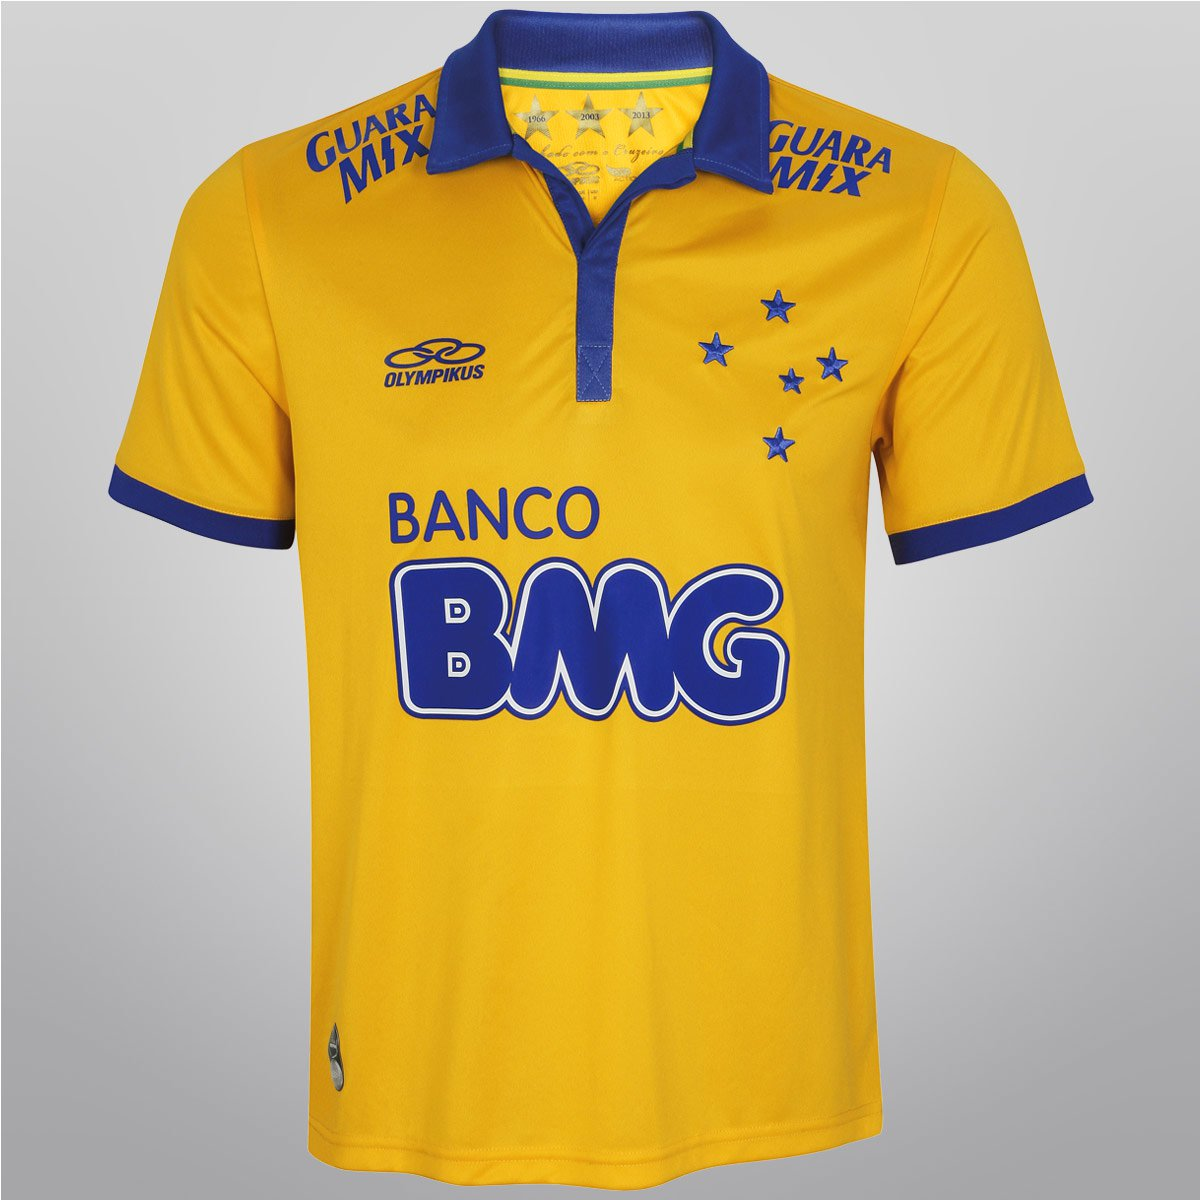 61865fa4418cd Camisa Olympikus Cruzeiro III 2014 s nº - Compre Agora